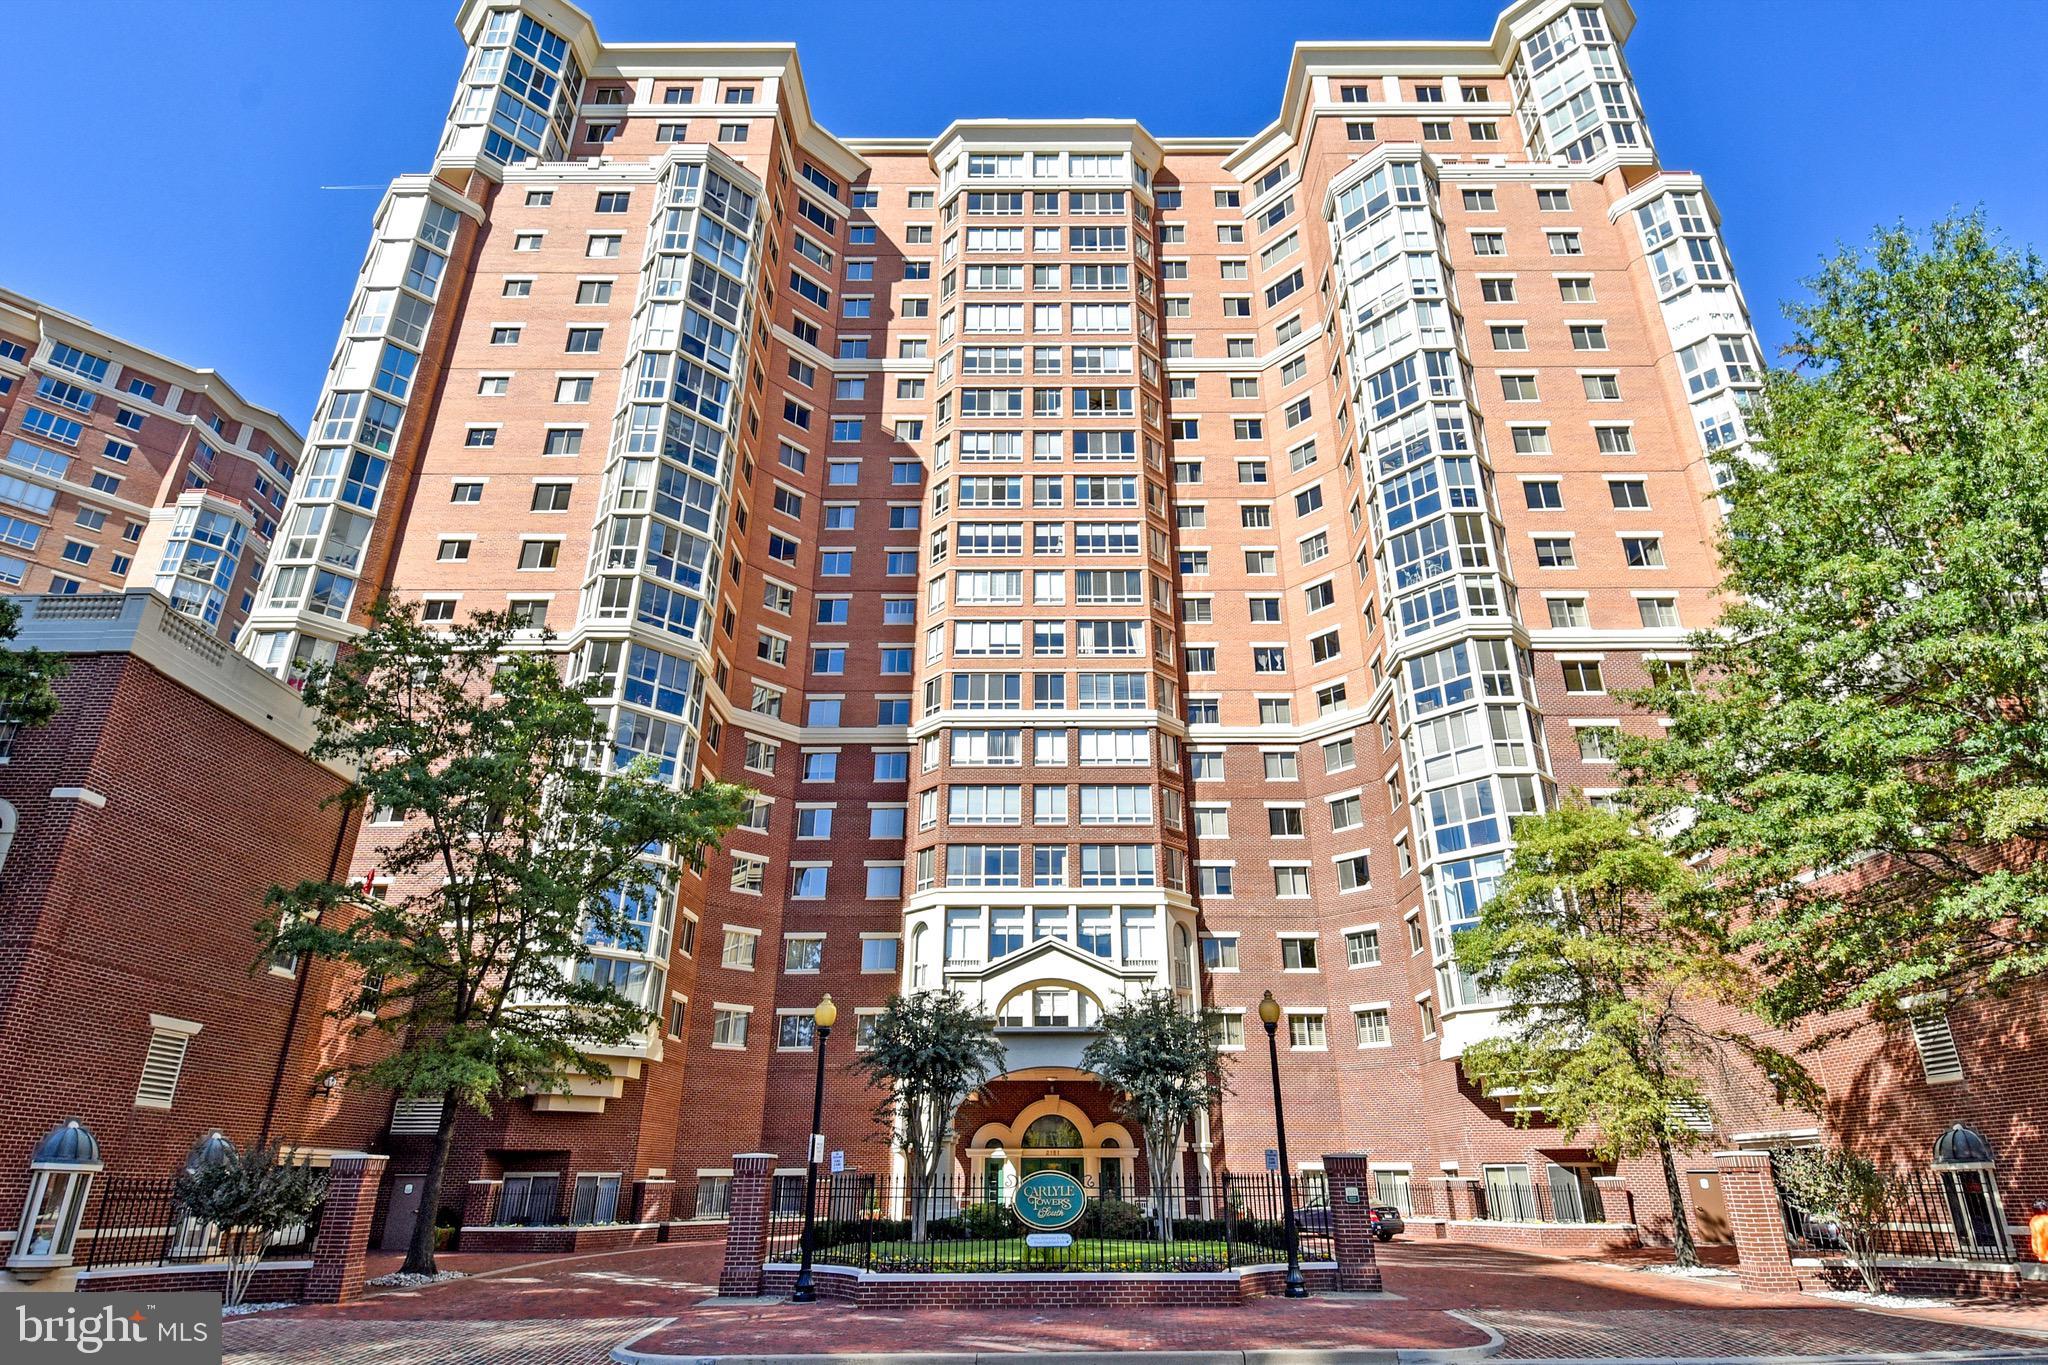 2151 Jamieson Avenue 2010, Alexandria, VA 22314